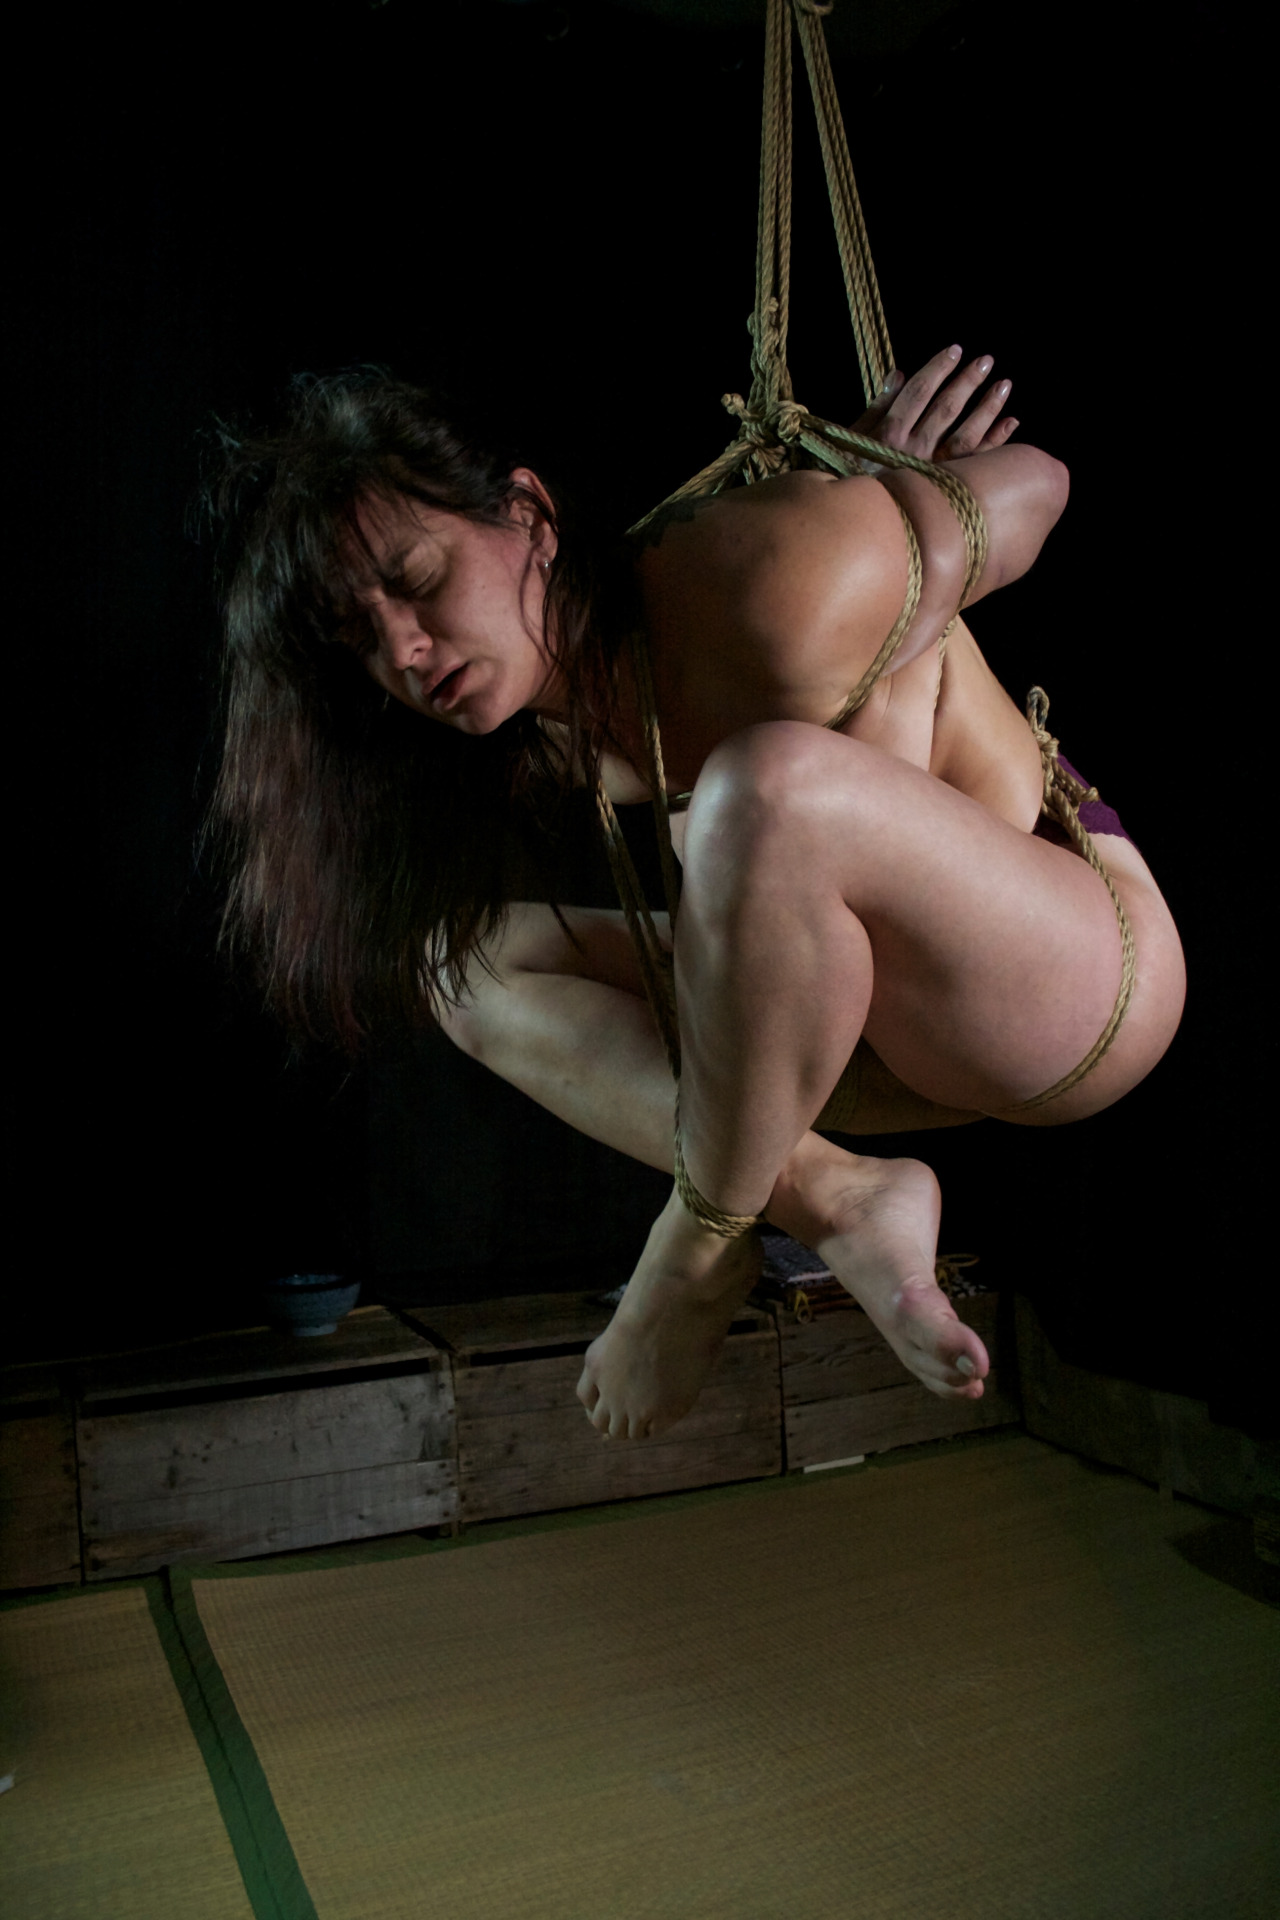 【SMエロ画像】バランス保った上でのプレイw真似しちゃいけない宙吊り緊縛M女www 05